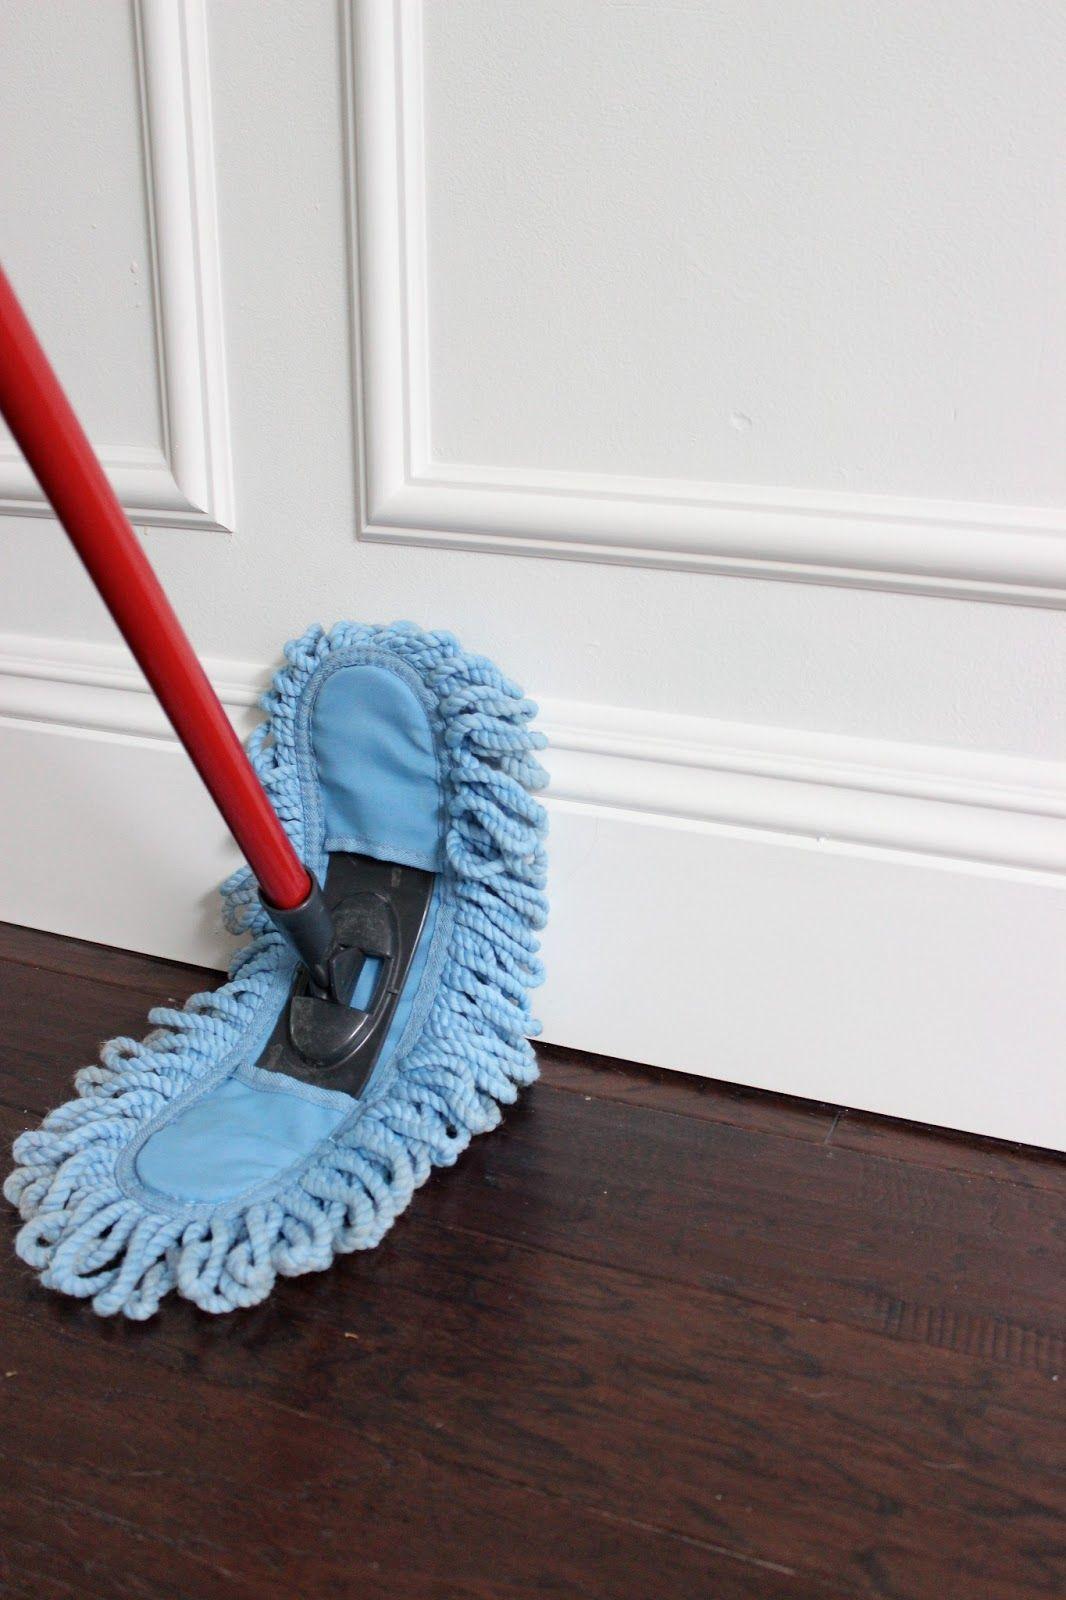 broom to clean hardwood floors